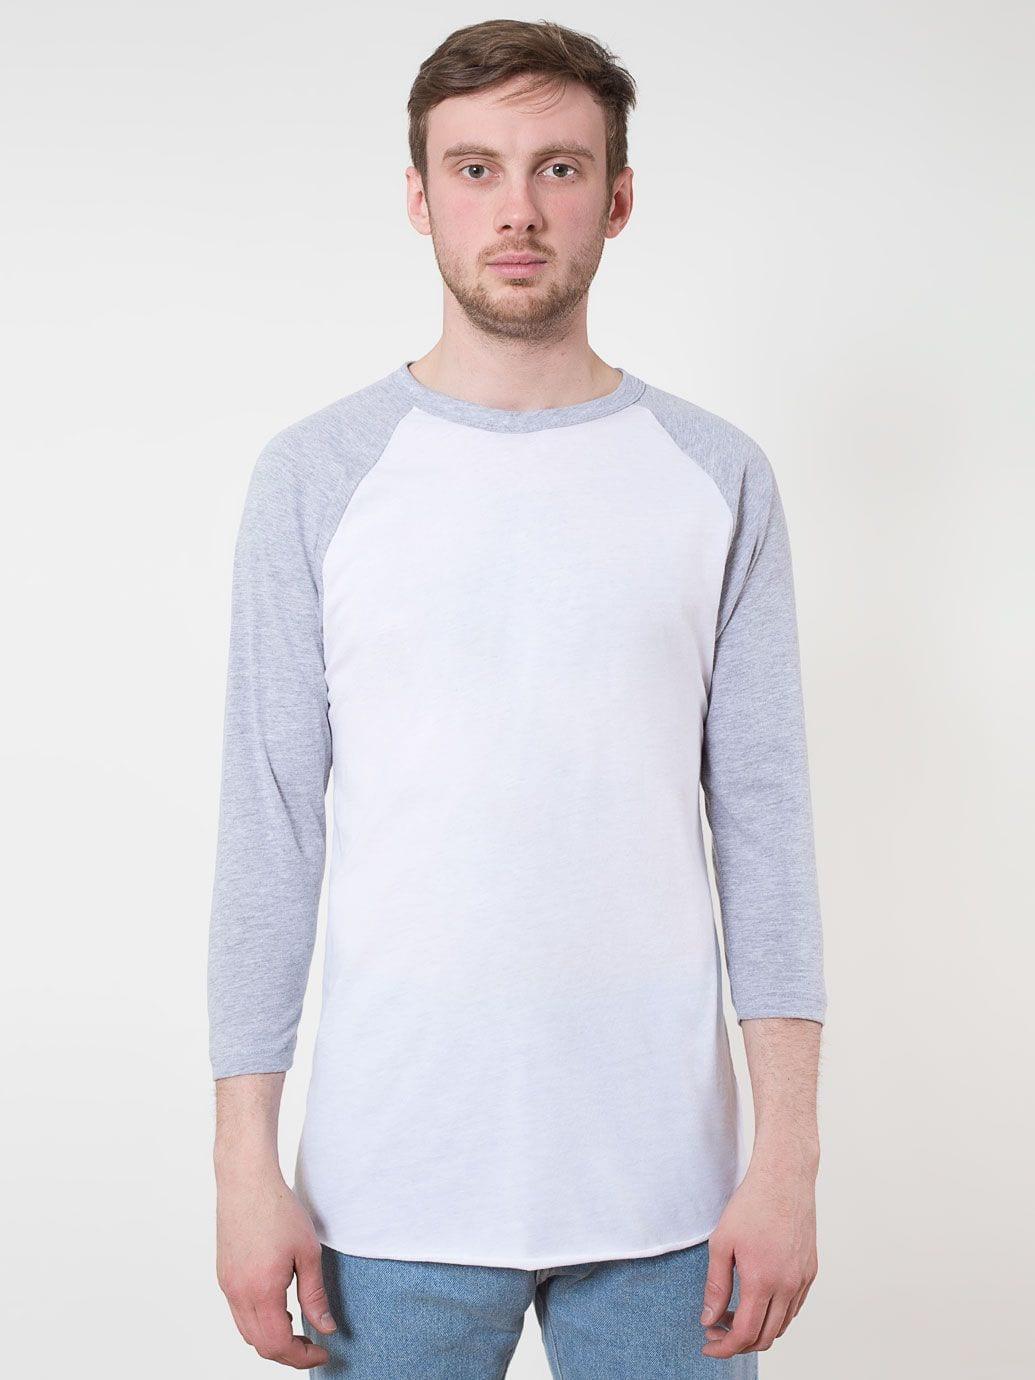 American apparel unisex 3 4 sleeve raglan t shirt for American apparel custom t shirt printing